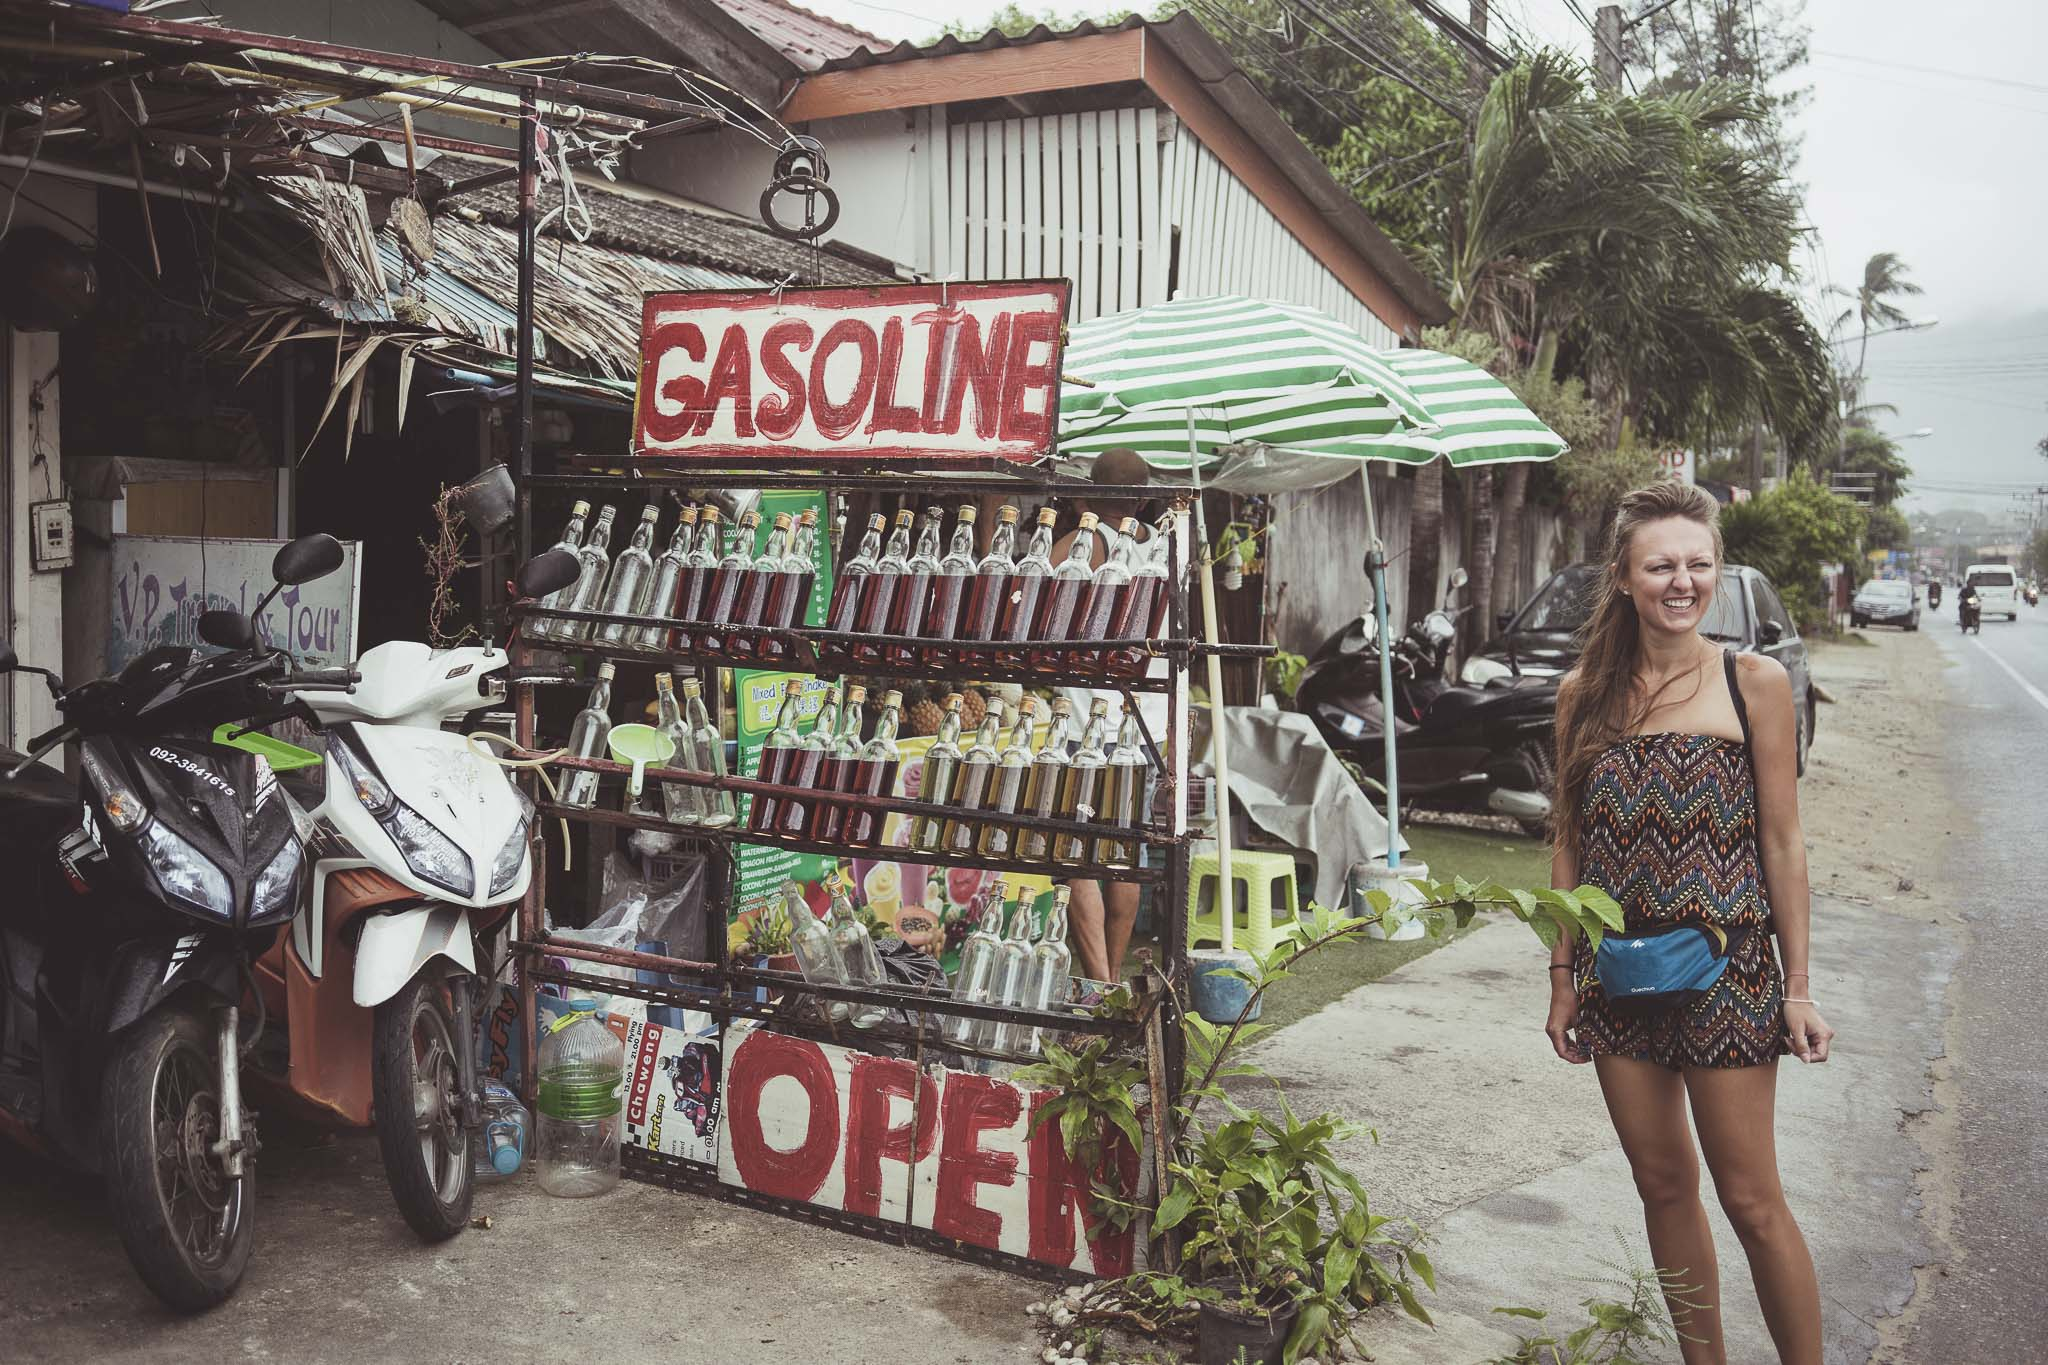 Kup pan gasoline, tanio